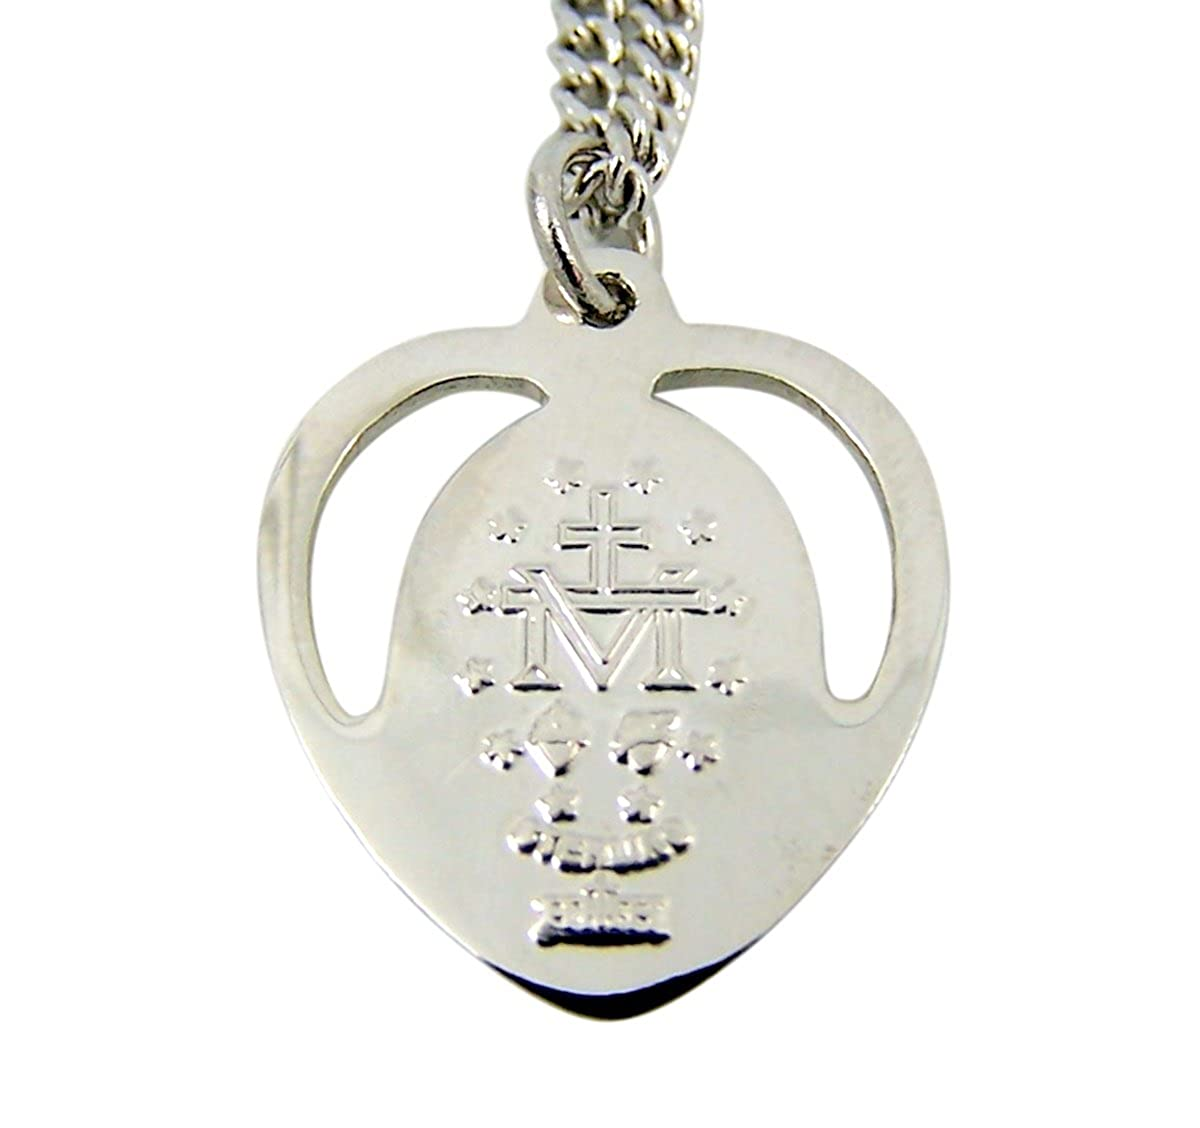 7//8 Inch Sterling Silver Blue Enameled Miraculous Medal Pierced Heart Pendant